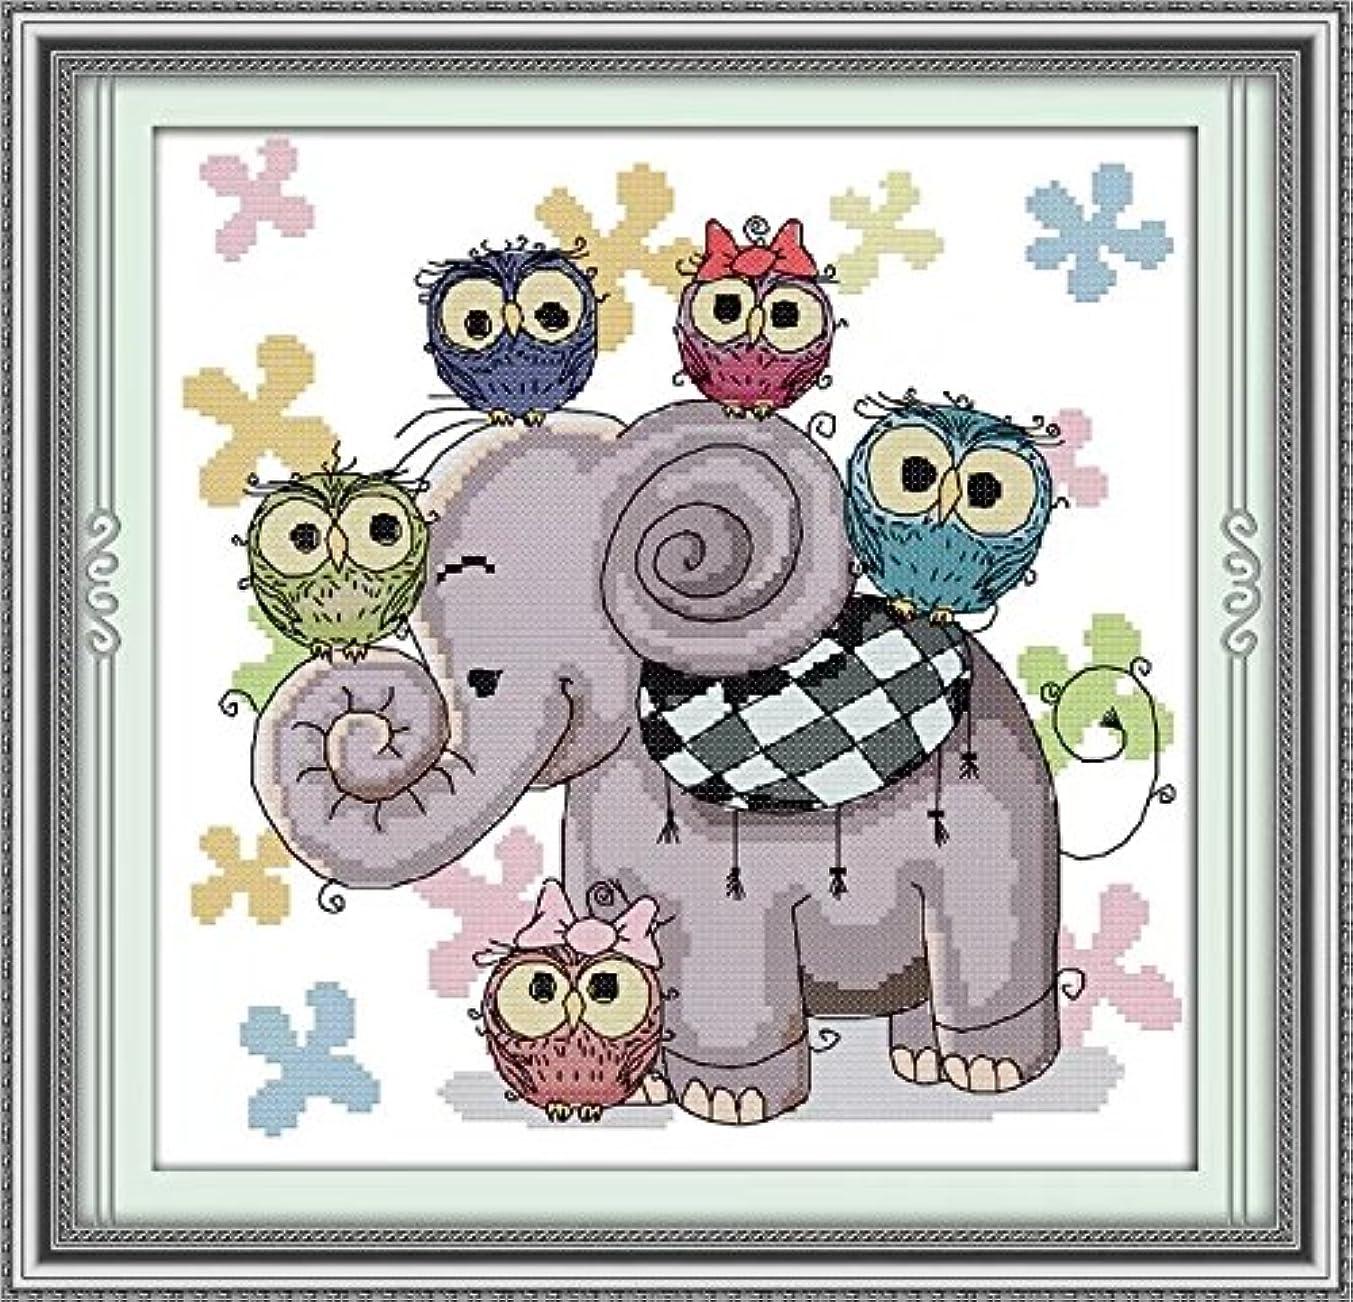 Joy Sunday Cross Stitch Kit 14CT Stamped Embroidery Kits Precise Printed Needlework-Elephant and owl 30×30CM